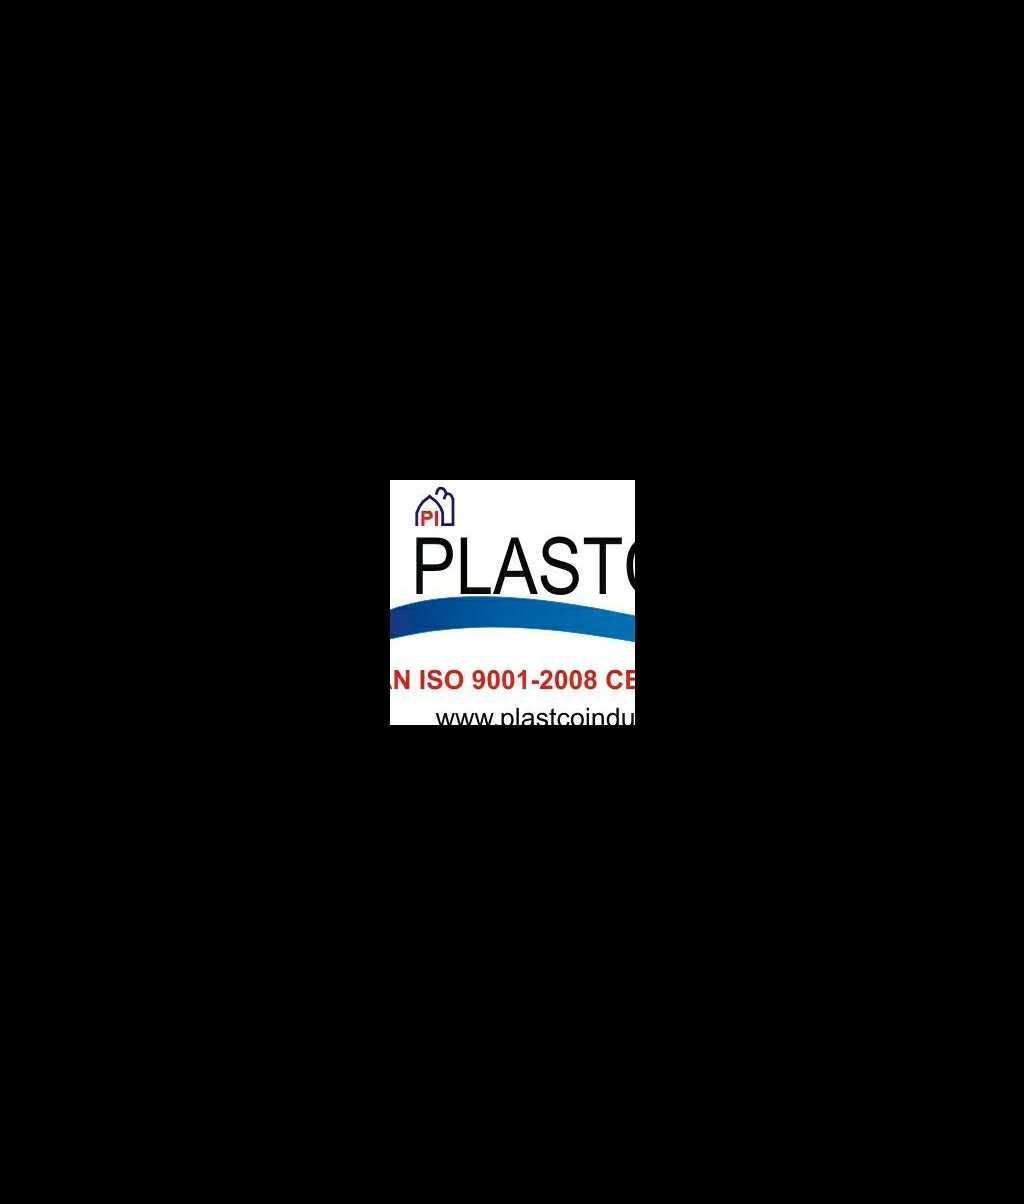 PLASTCO INDUSTRIES